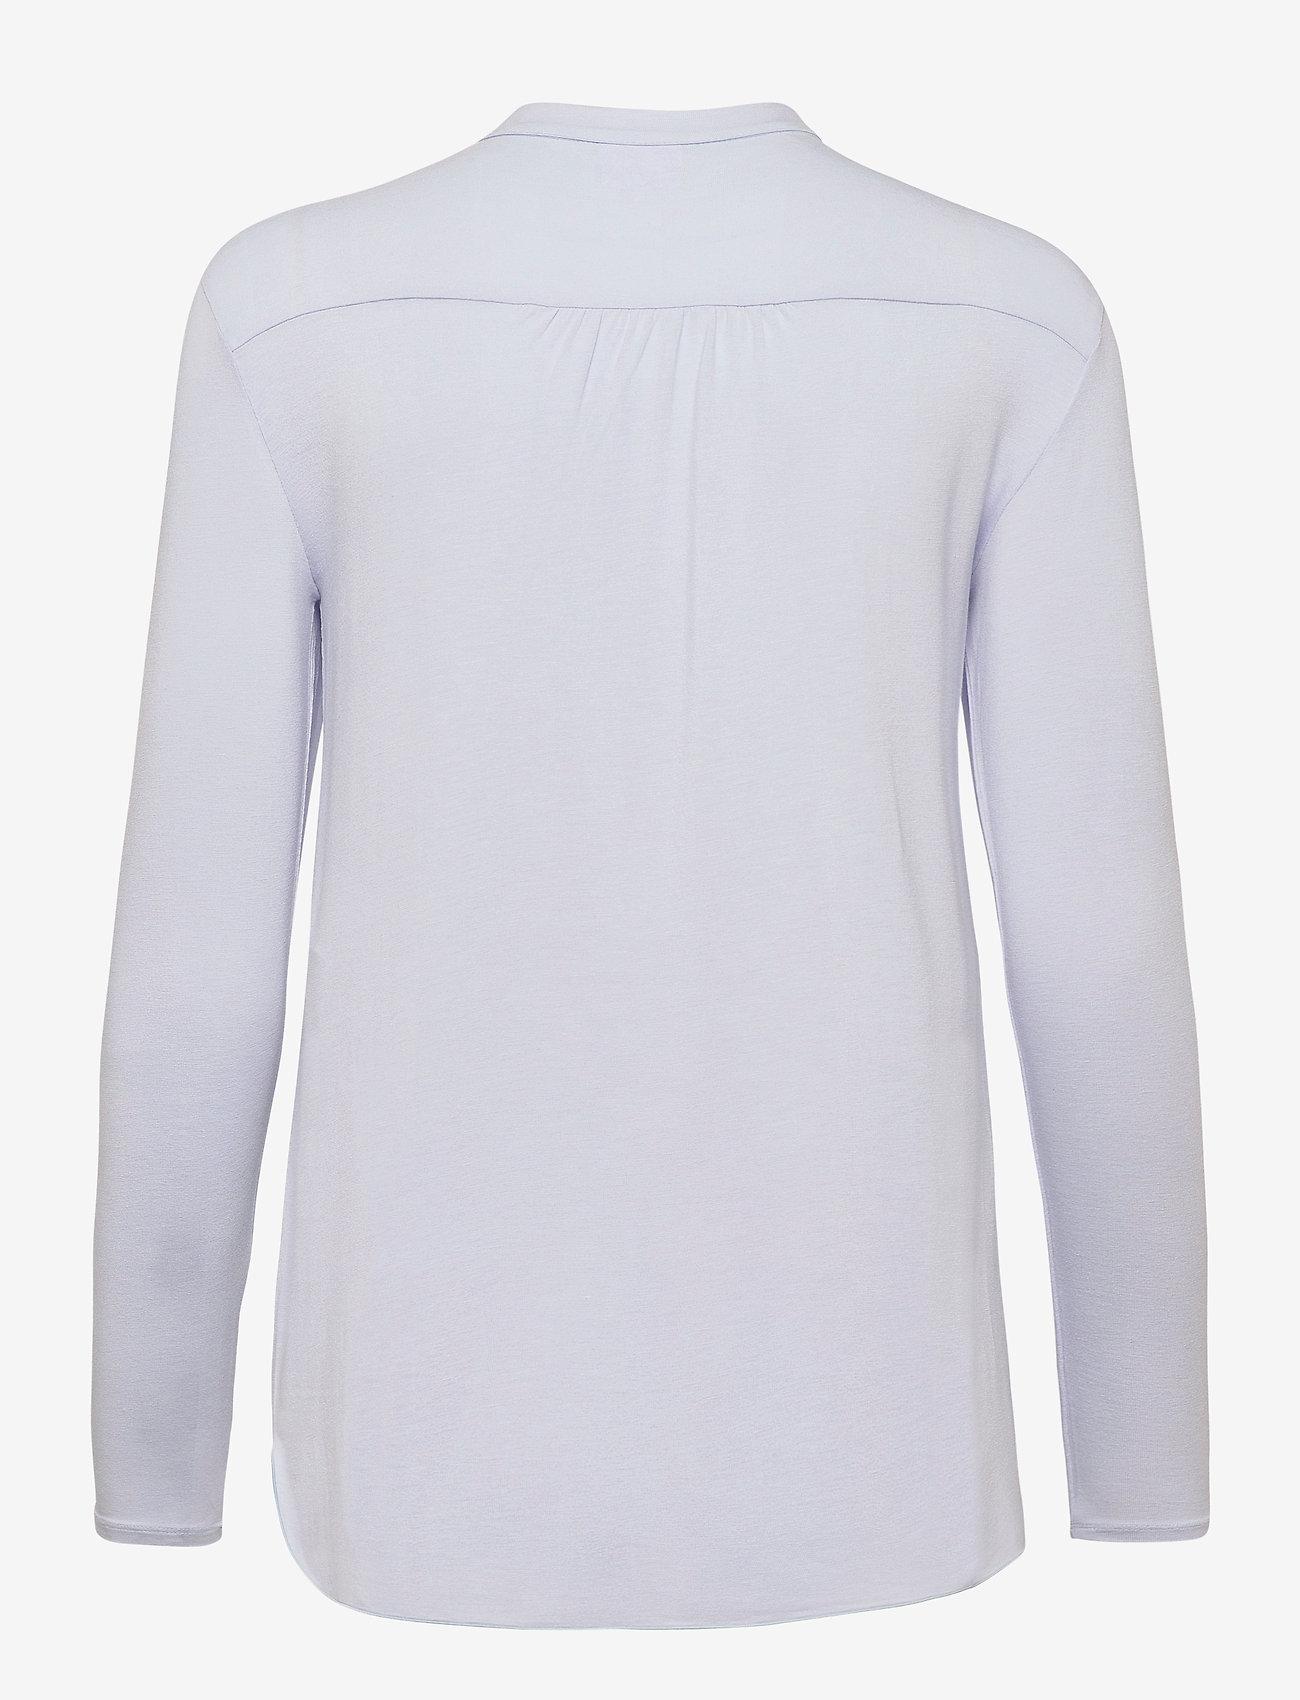 Max Mara Leisure - HAITI - long sleeved blouses - light blue - 1